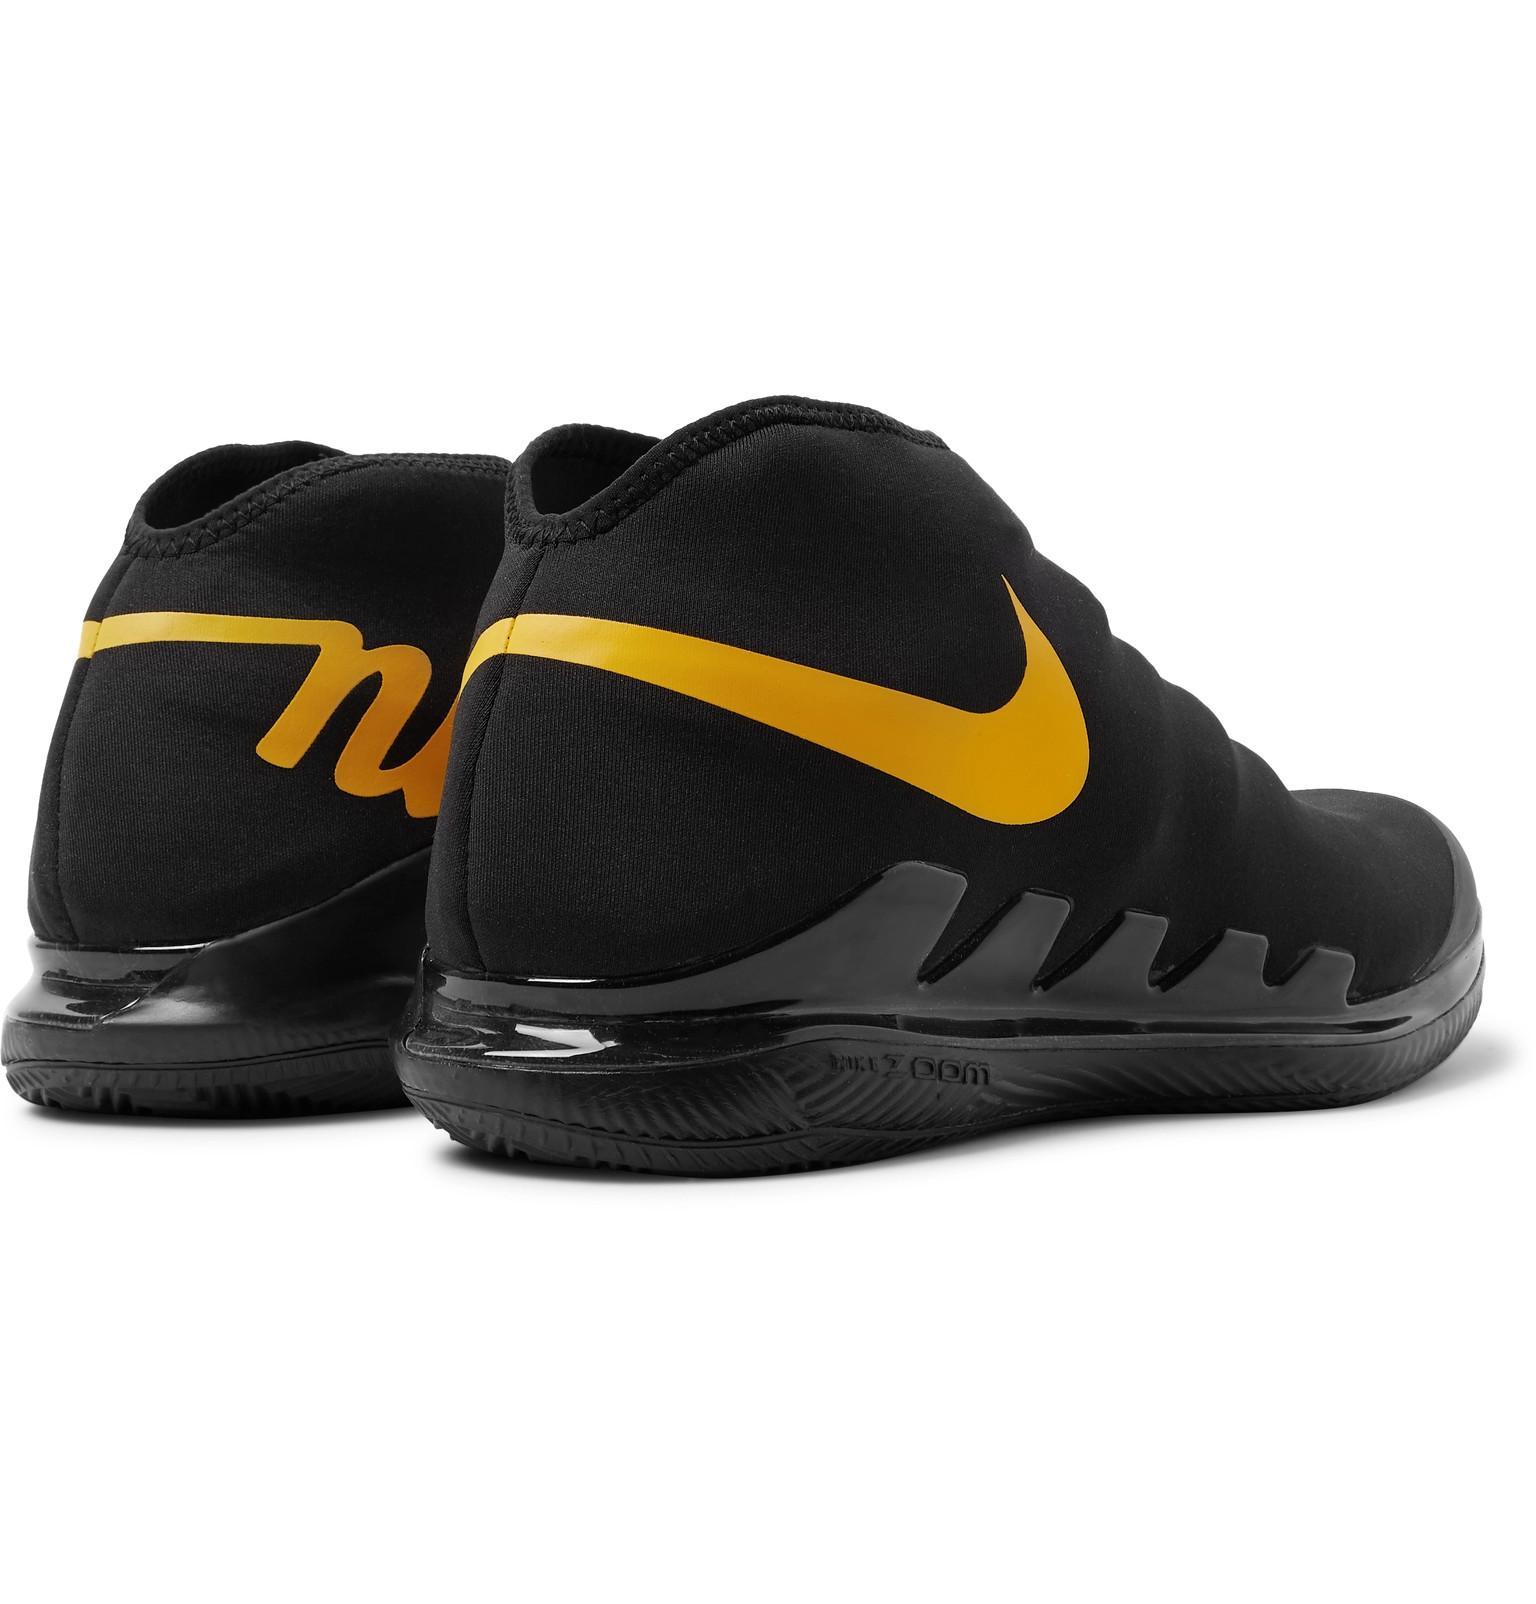 Air Zoom Vapor X Glove Neoprene, Rubber And Mesh Tennis Sneakers